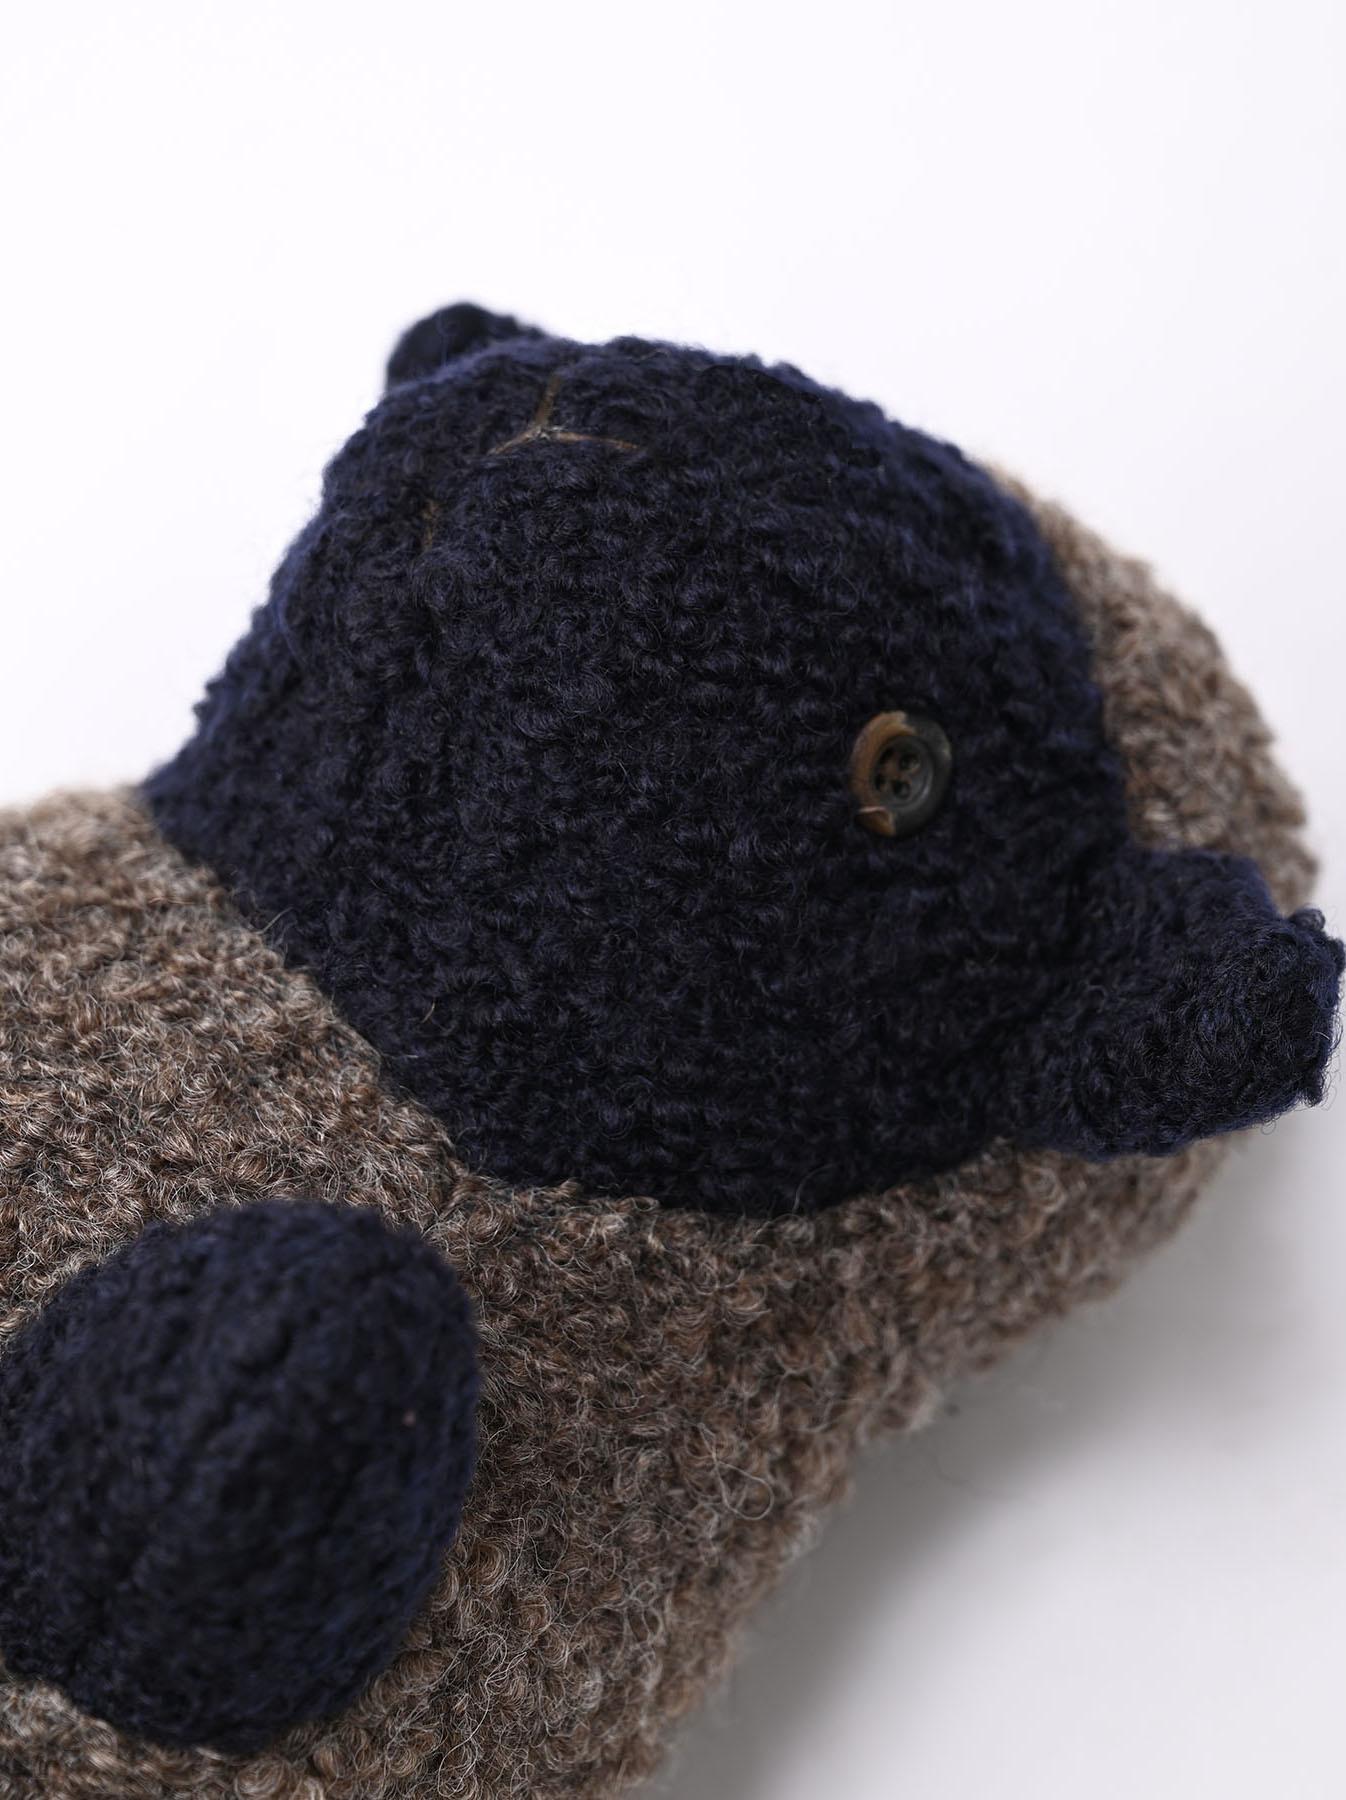 Stuffed Toy Sheep-9